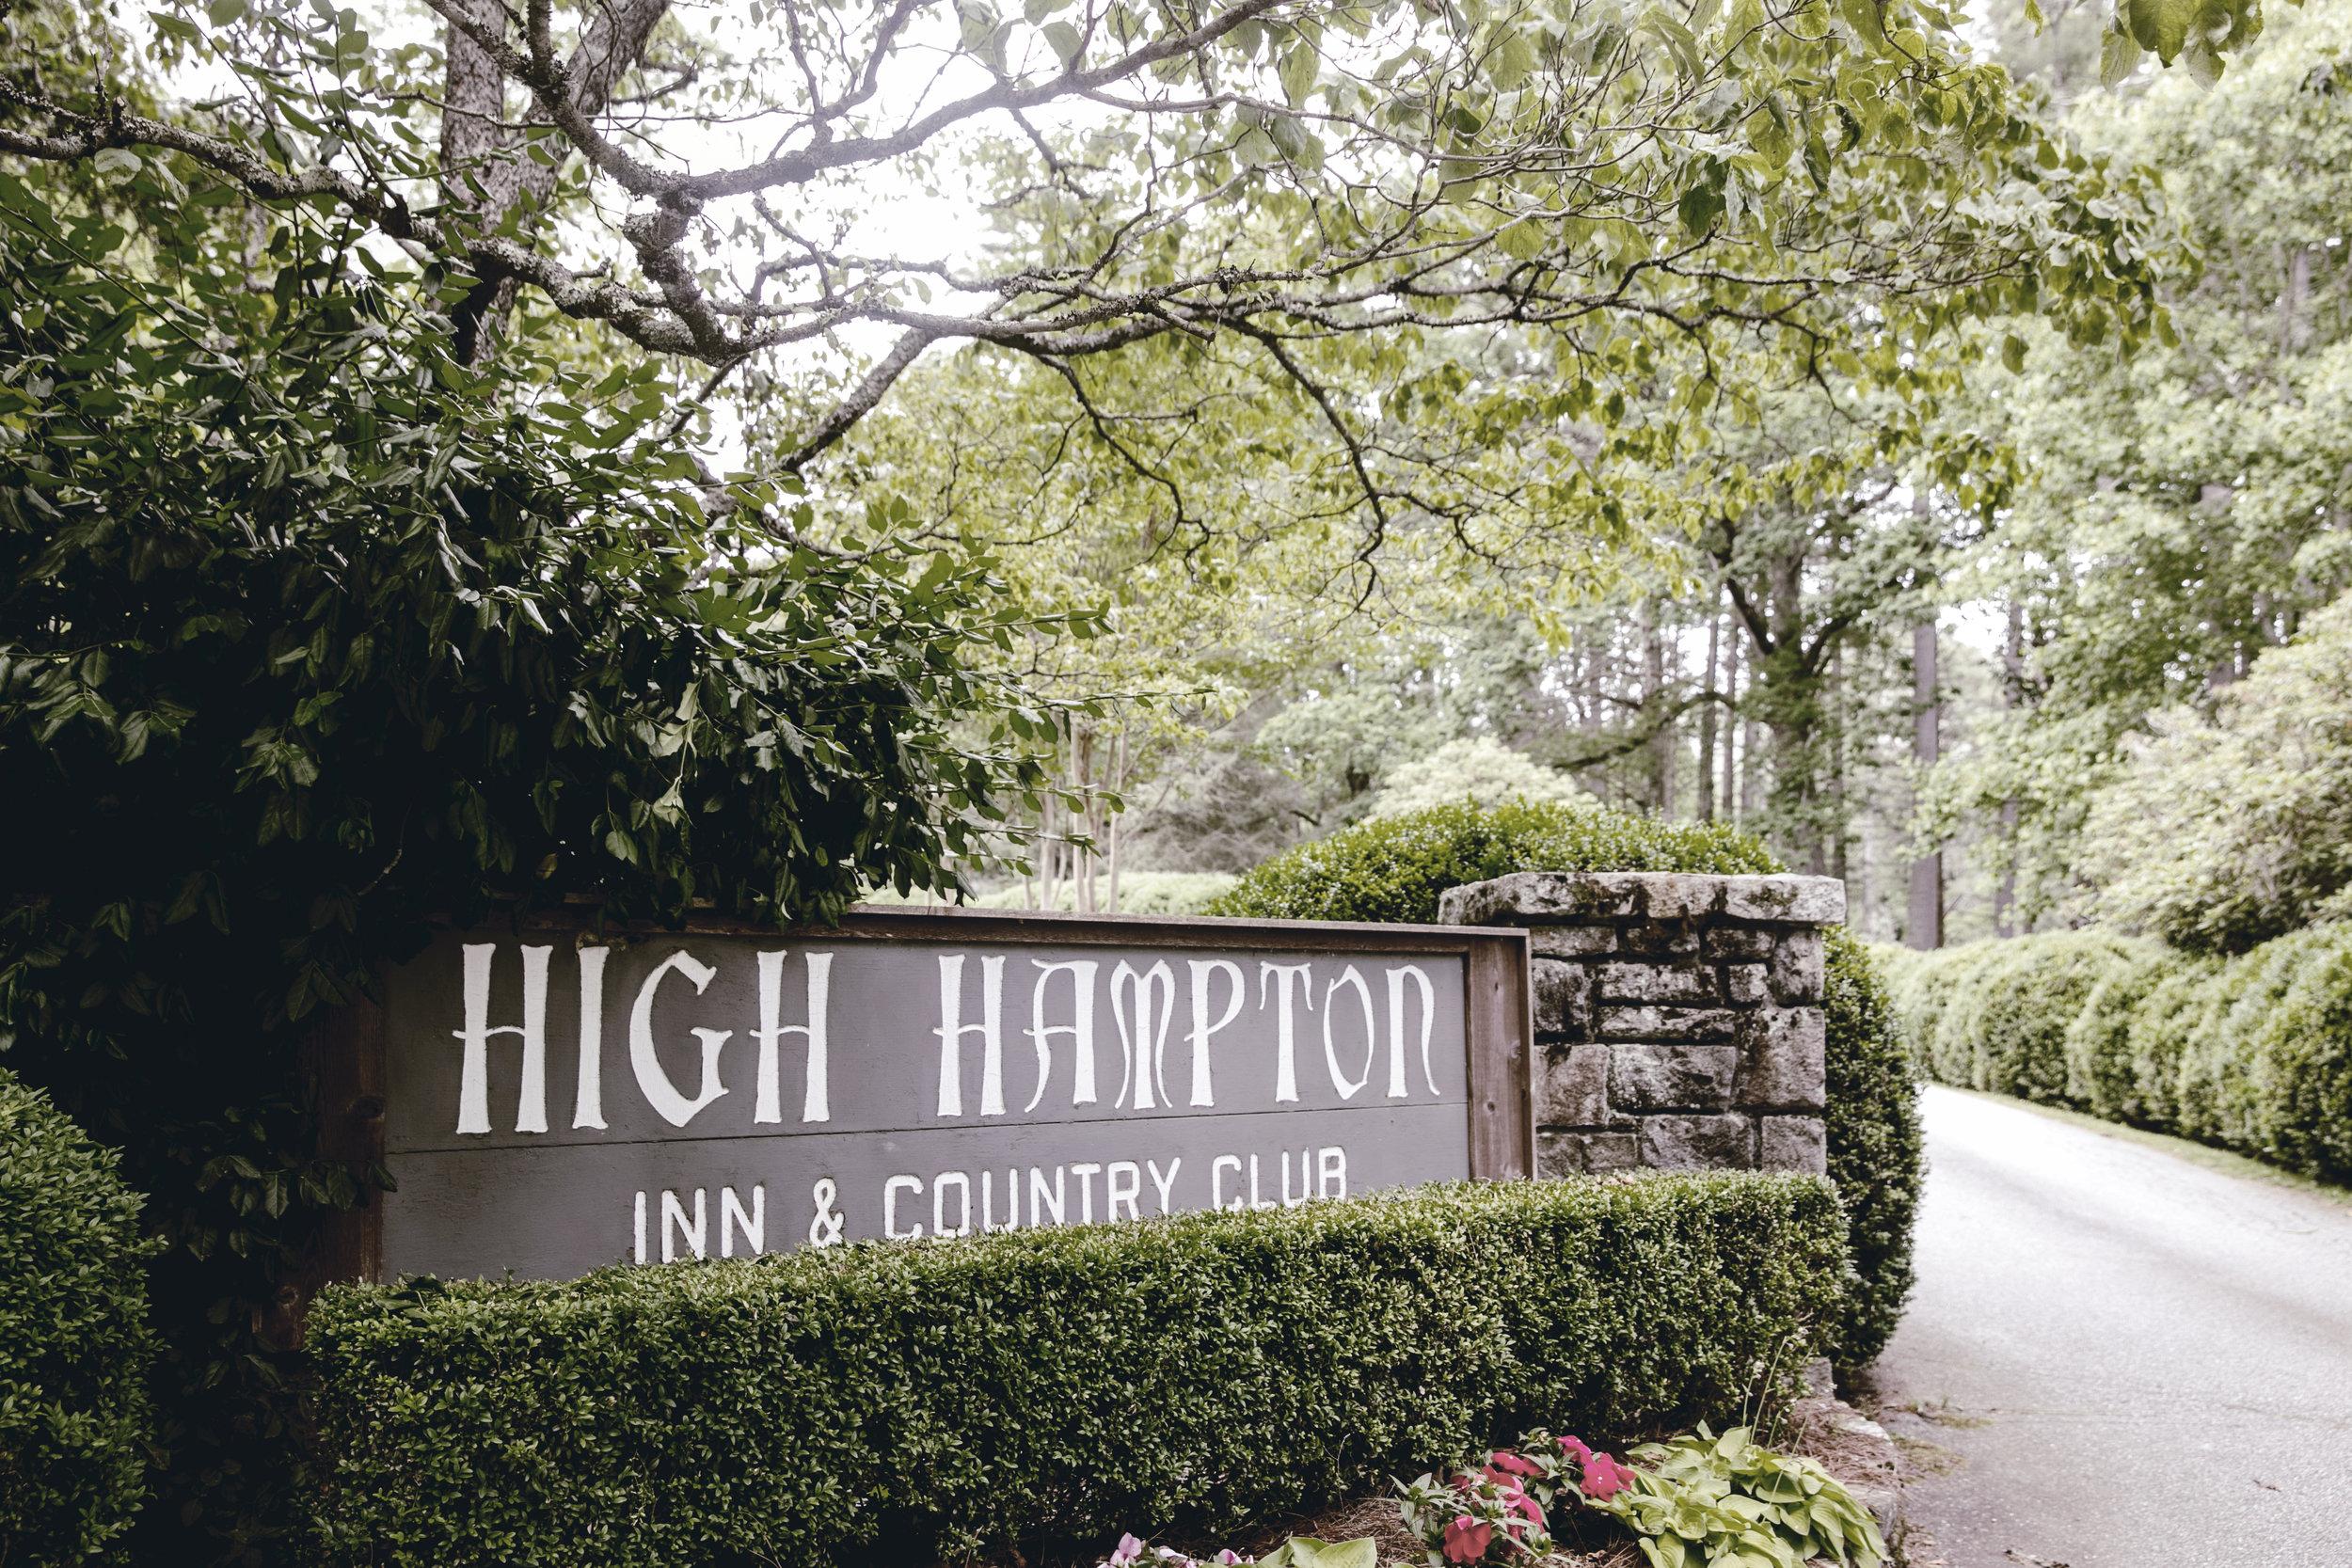 high hampton inn sign / heirloomed